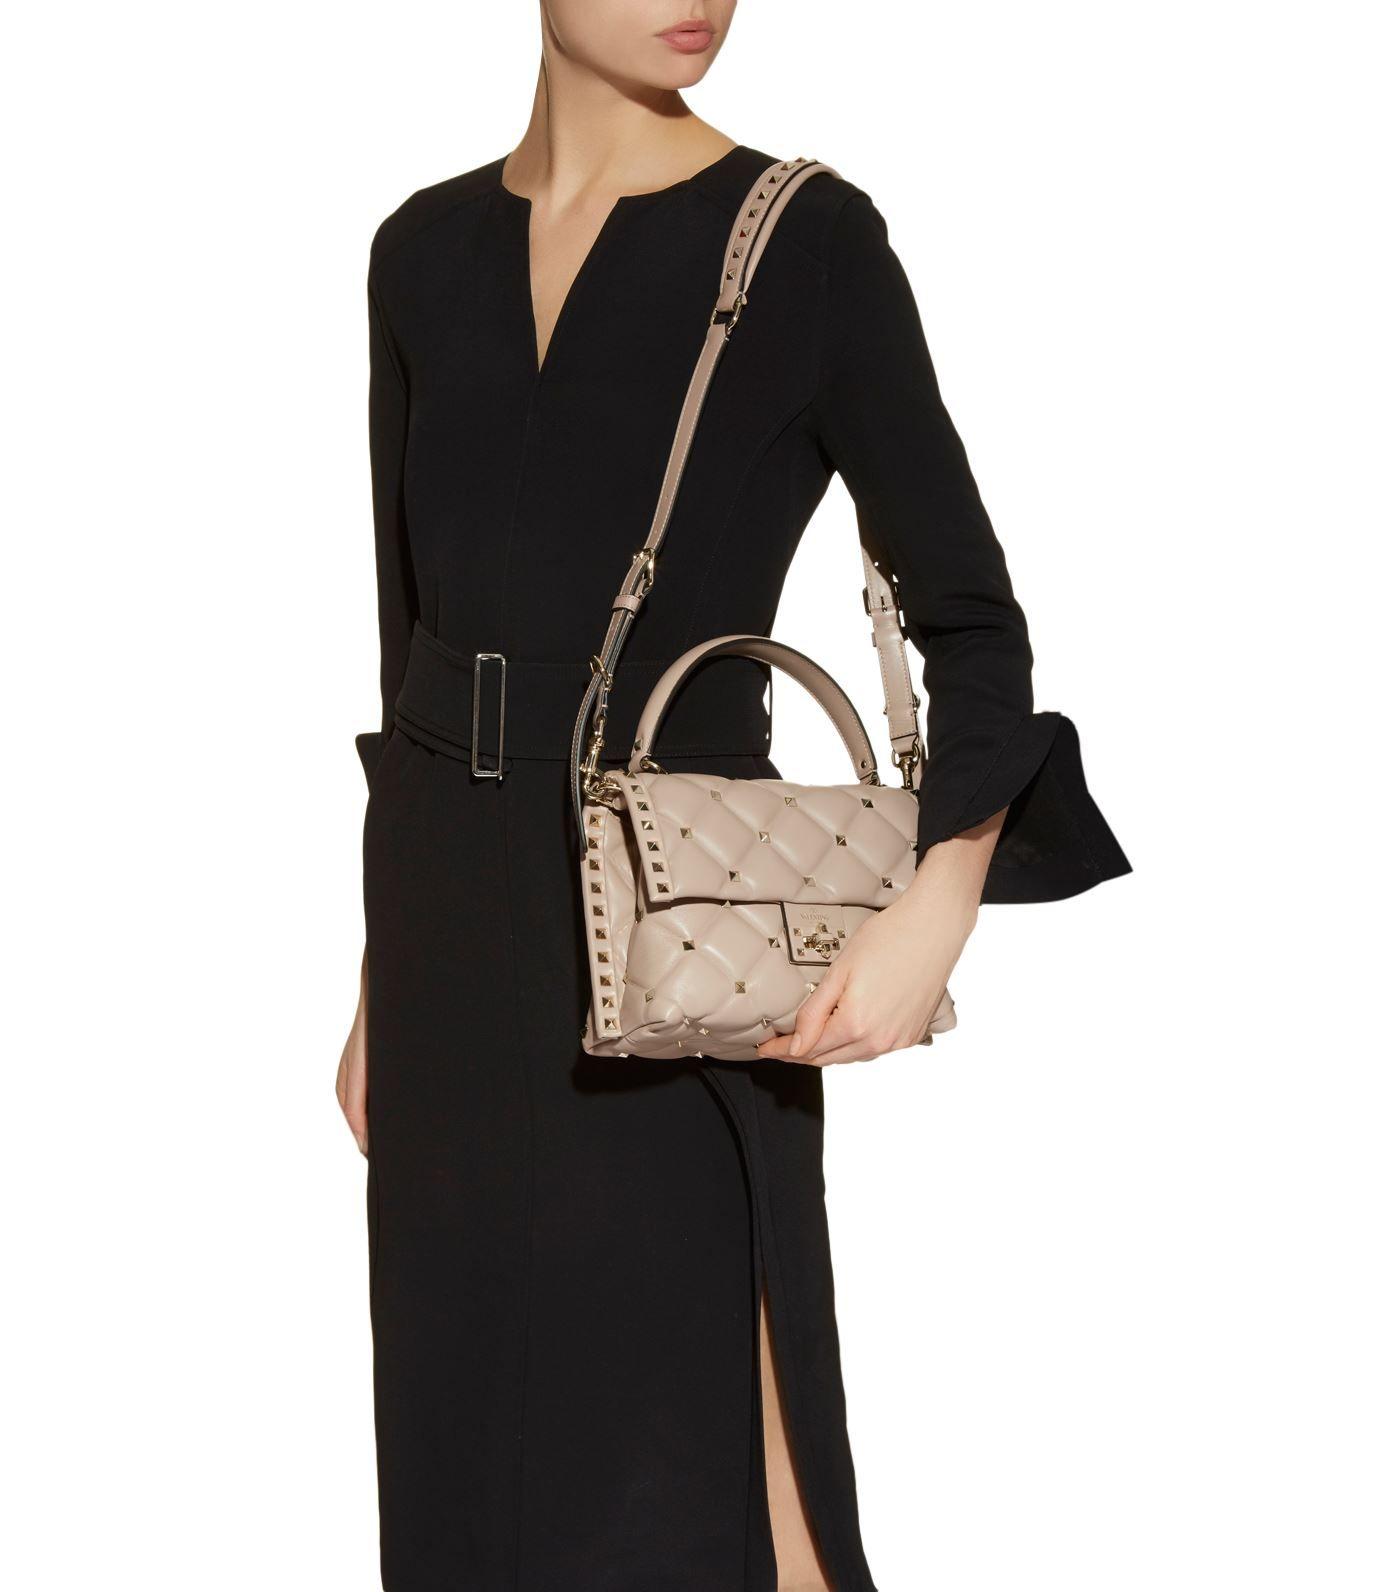 4d921425fa0 Valentino Garavani Mini Leather Candystud Top Handle Bag #AD , #AFFILIATE, # Mini, #Leather, #Valentino, #Garavani, #Handle